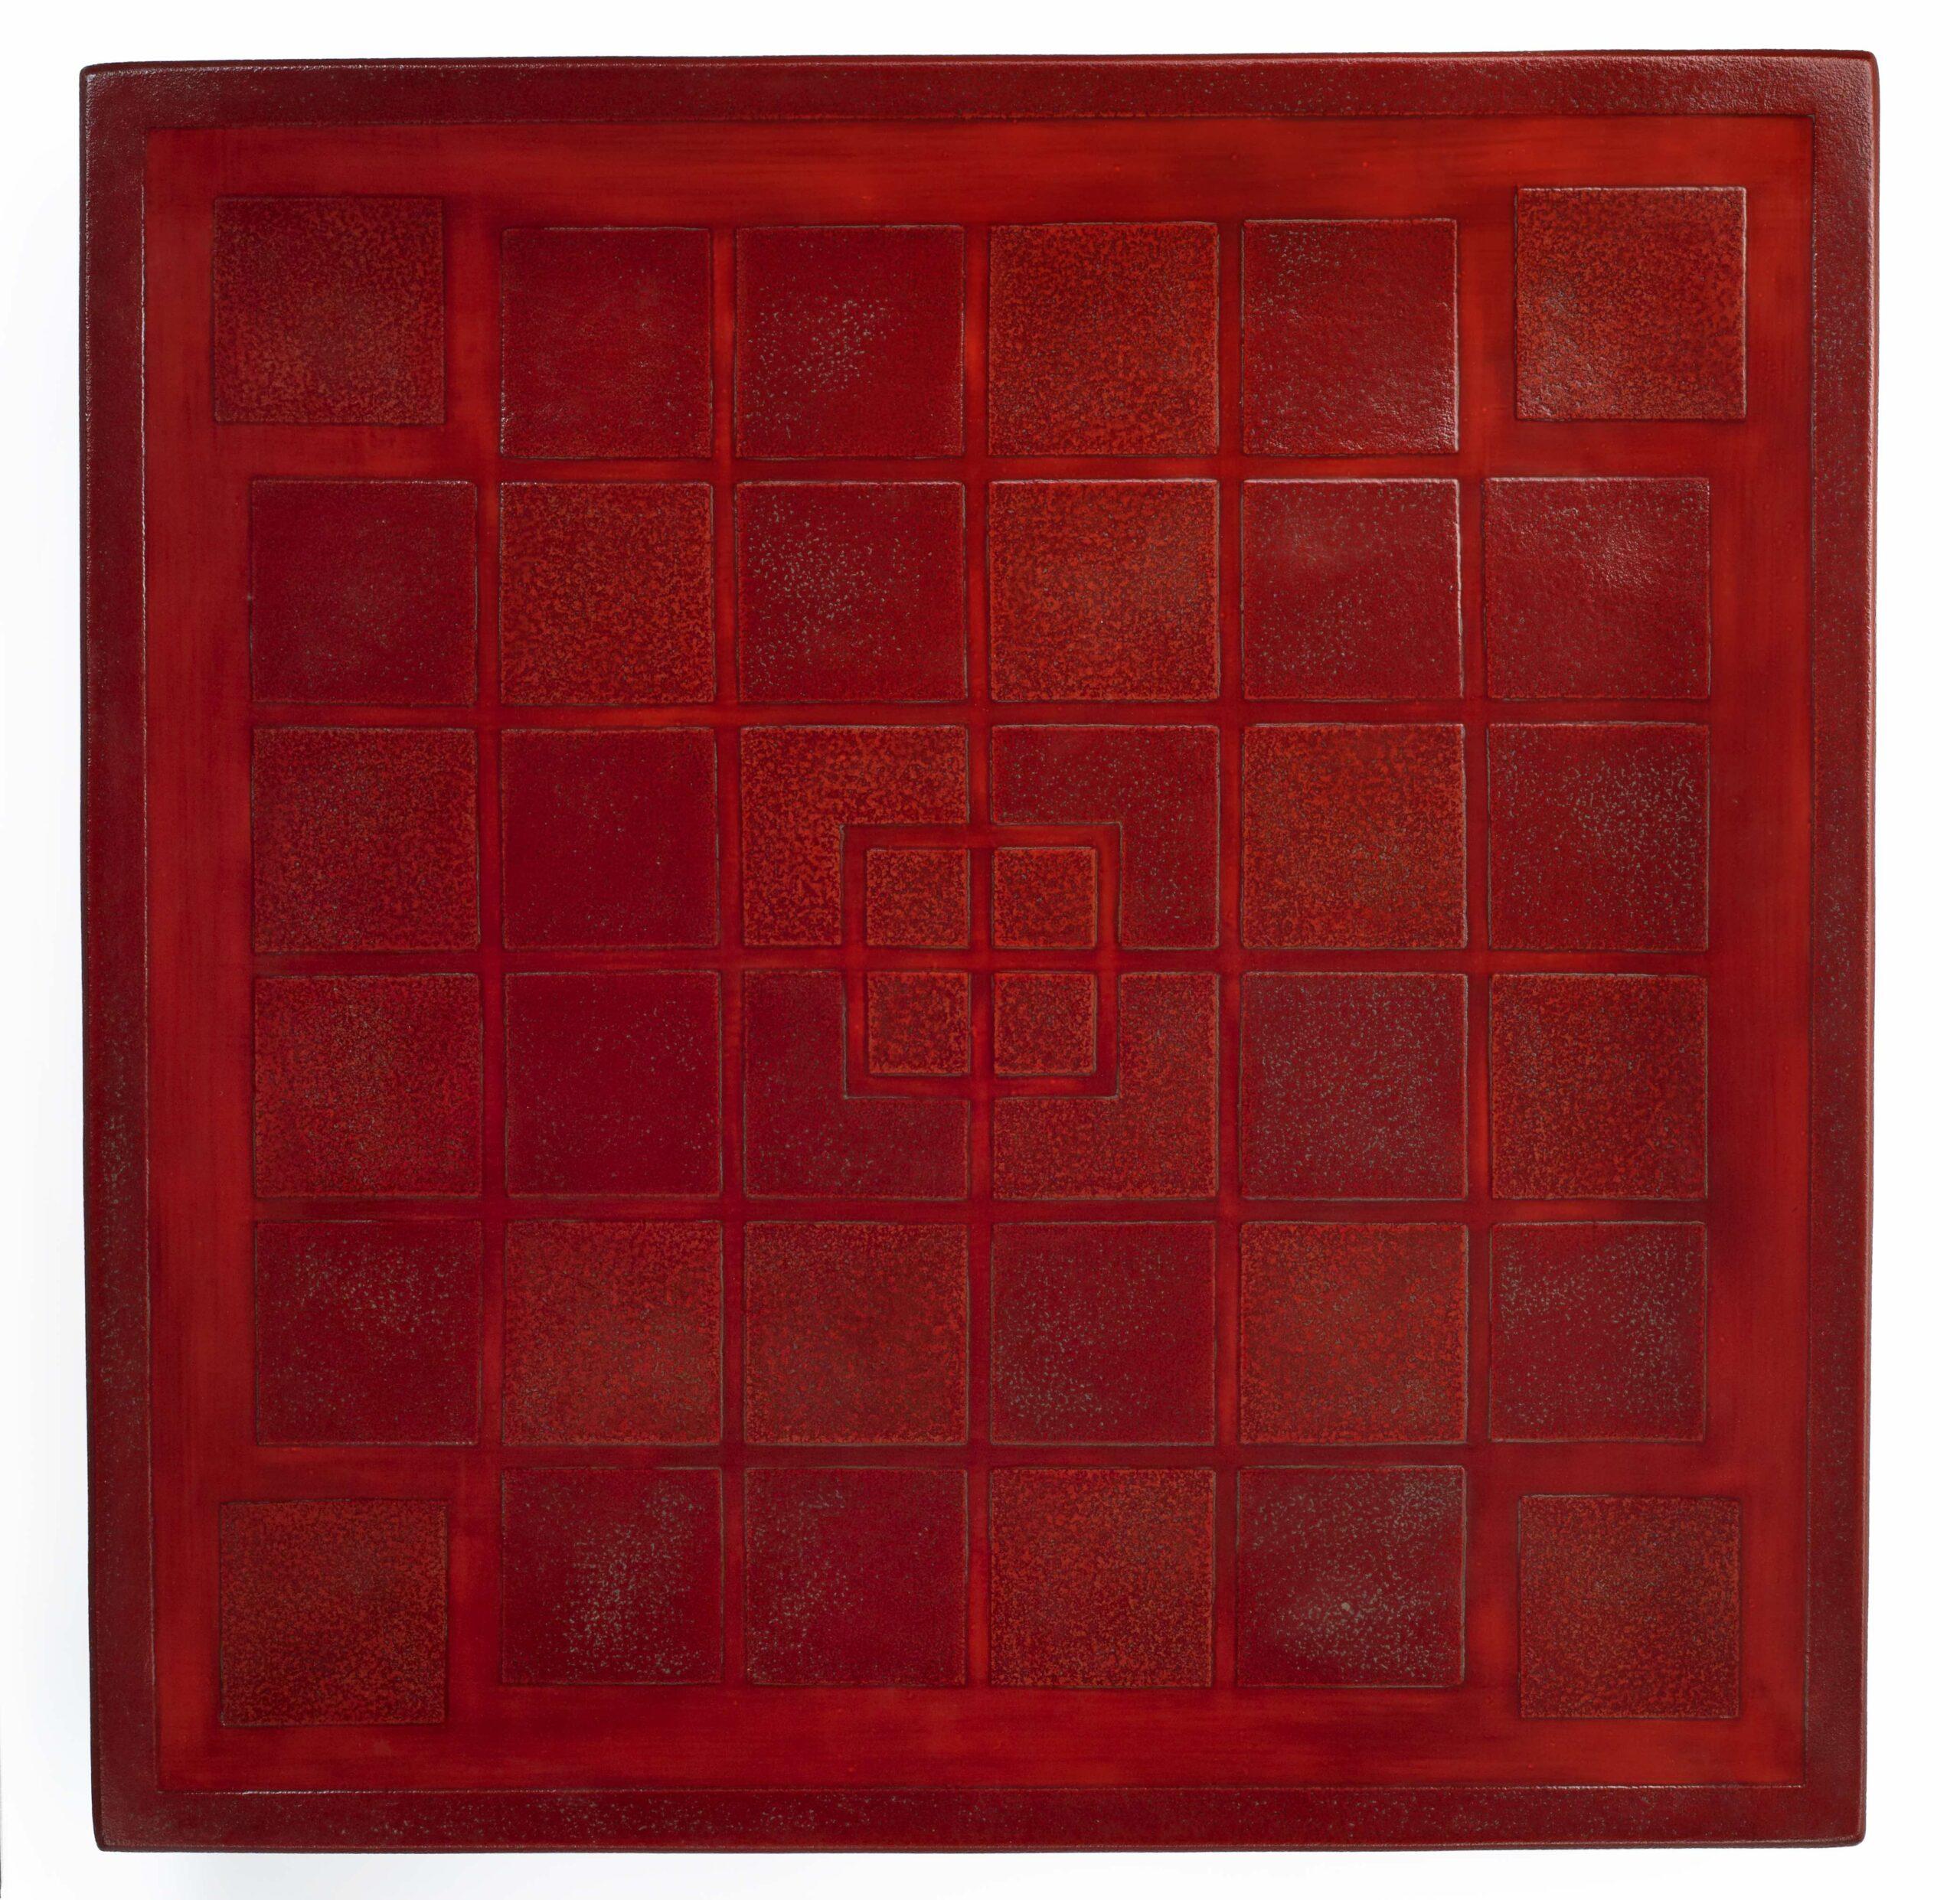 ORNAMENTAL TRAY kasari bon by ISAO Huyuki (Fuyuki) (b. 1927)   Showa period, 1950/60s Lacquer on wood